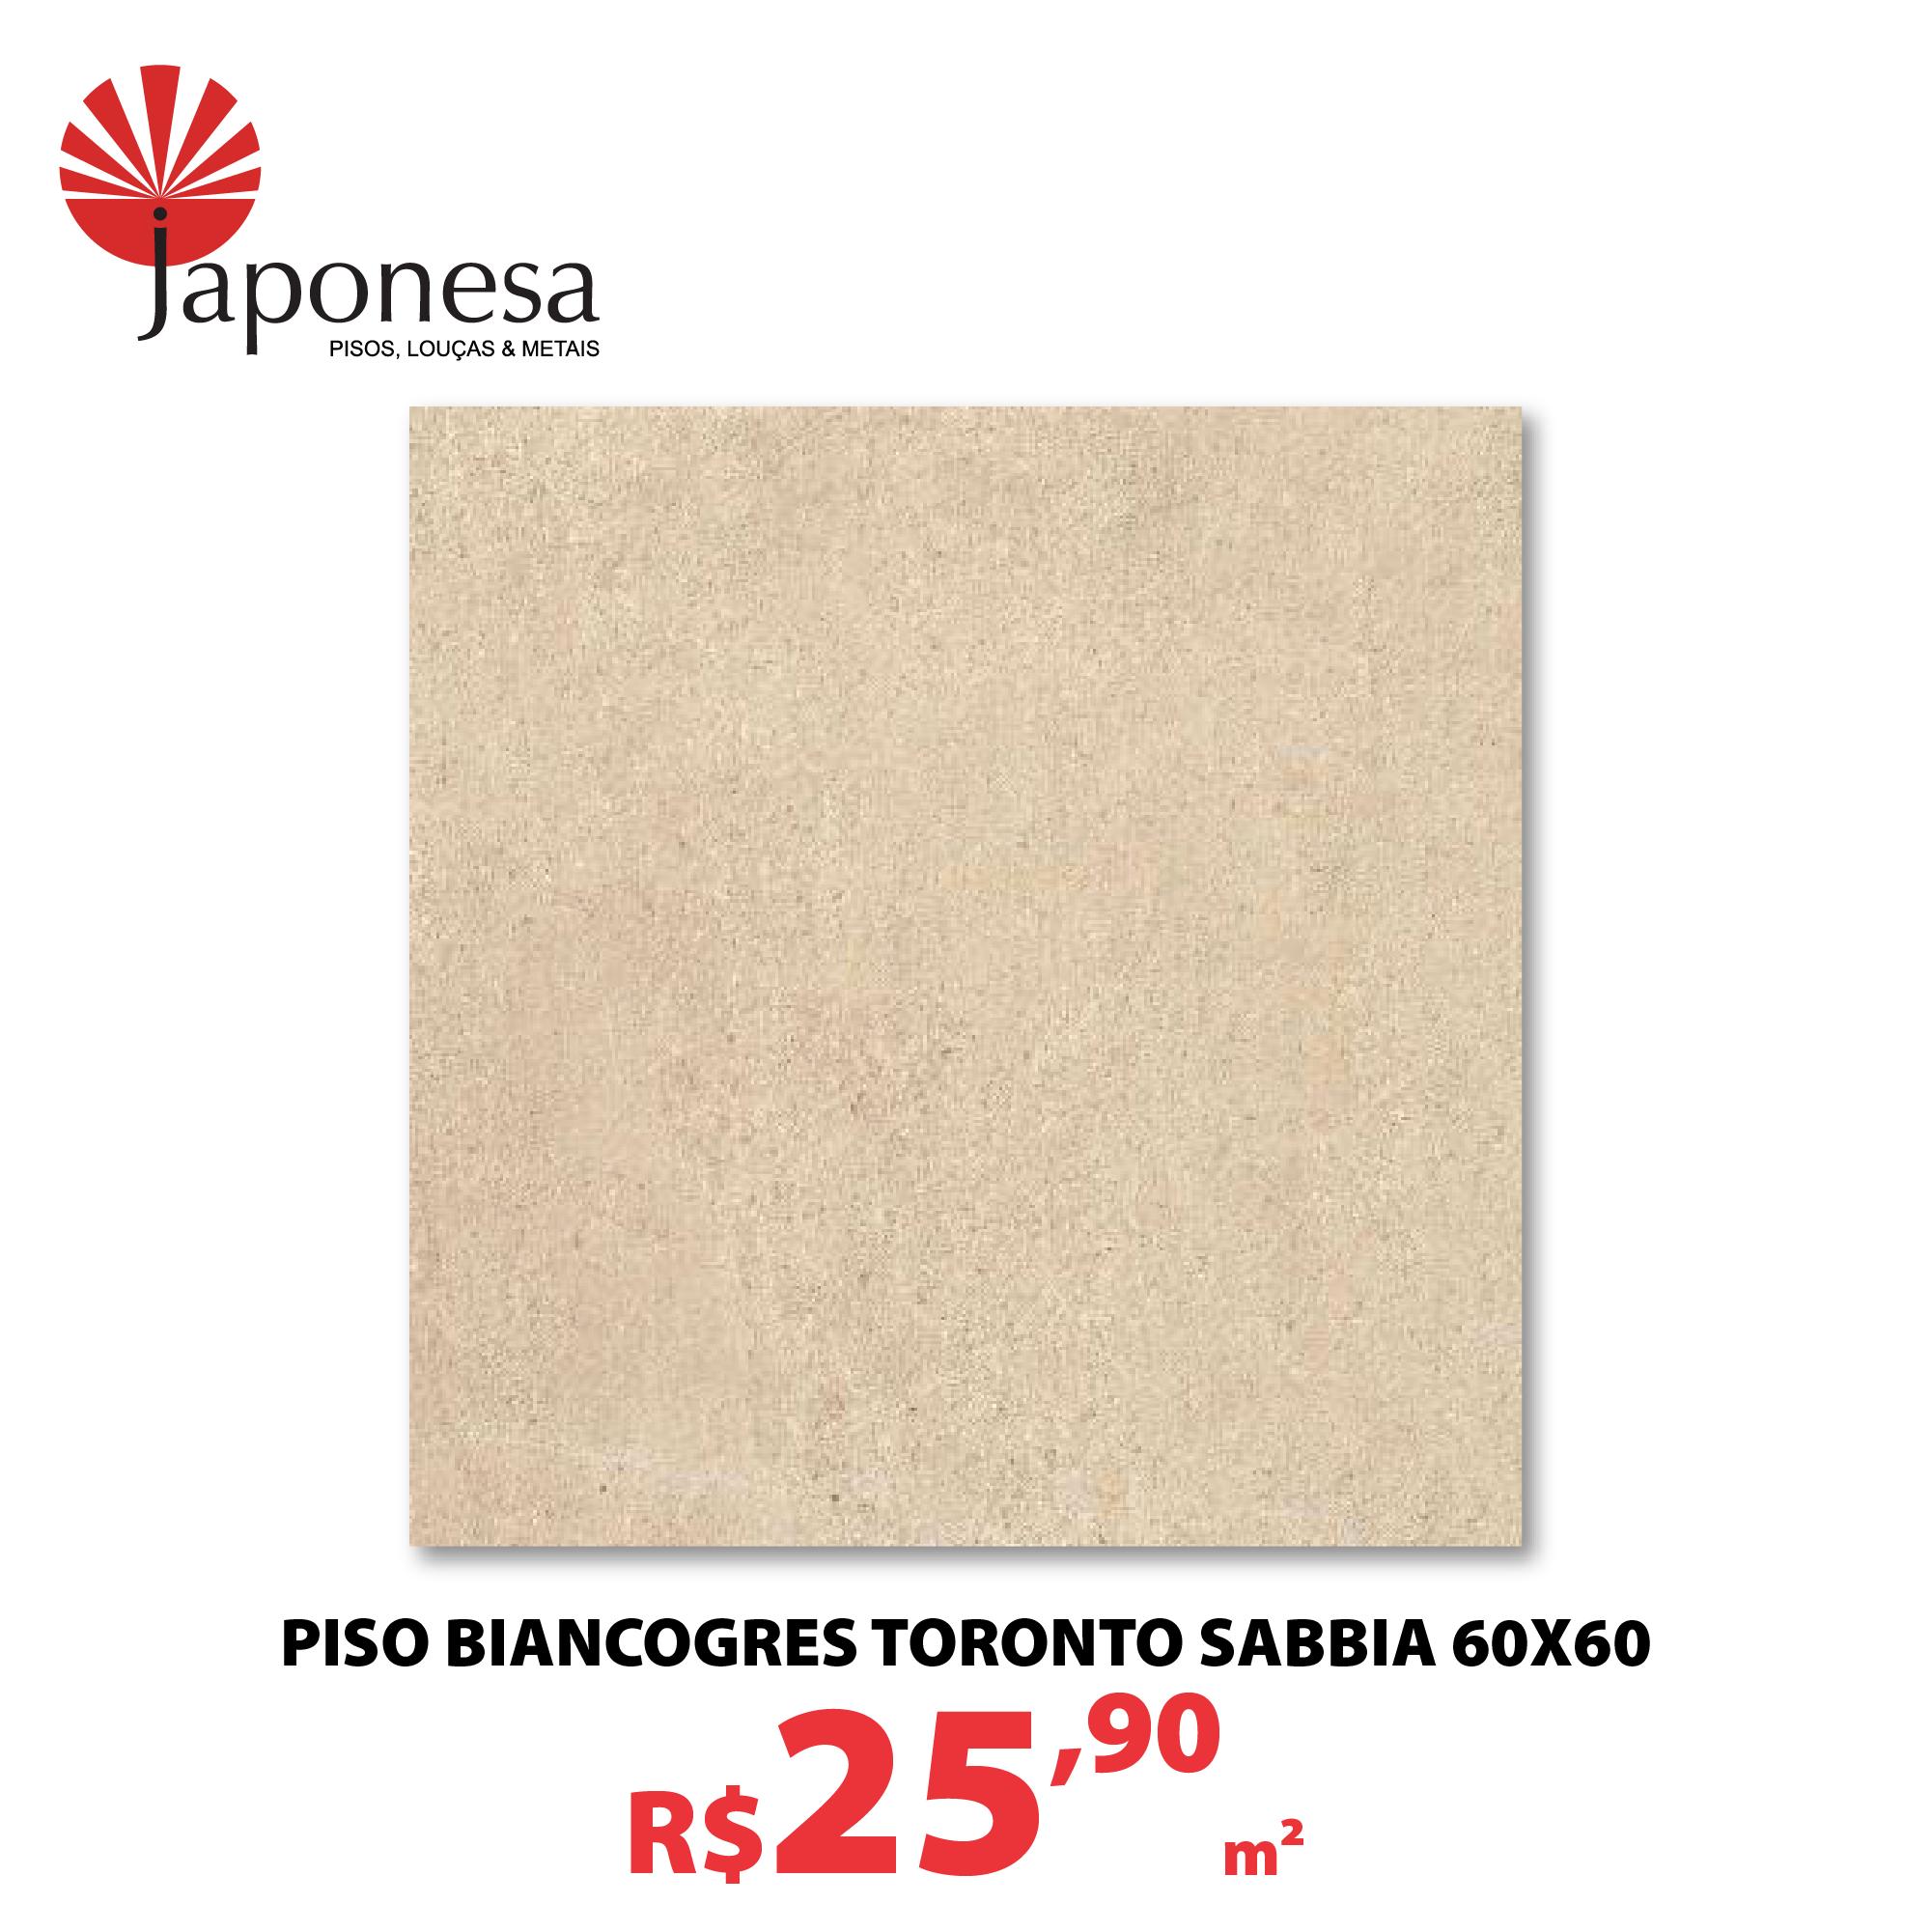 PISO BIANCOGRES TORONTO SABBIA 60X60